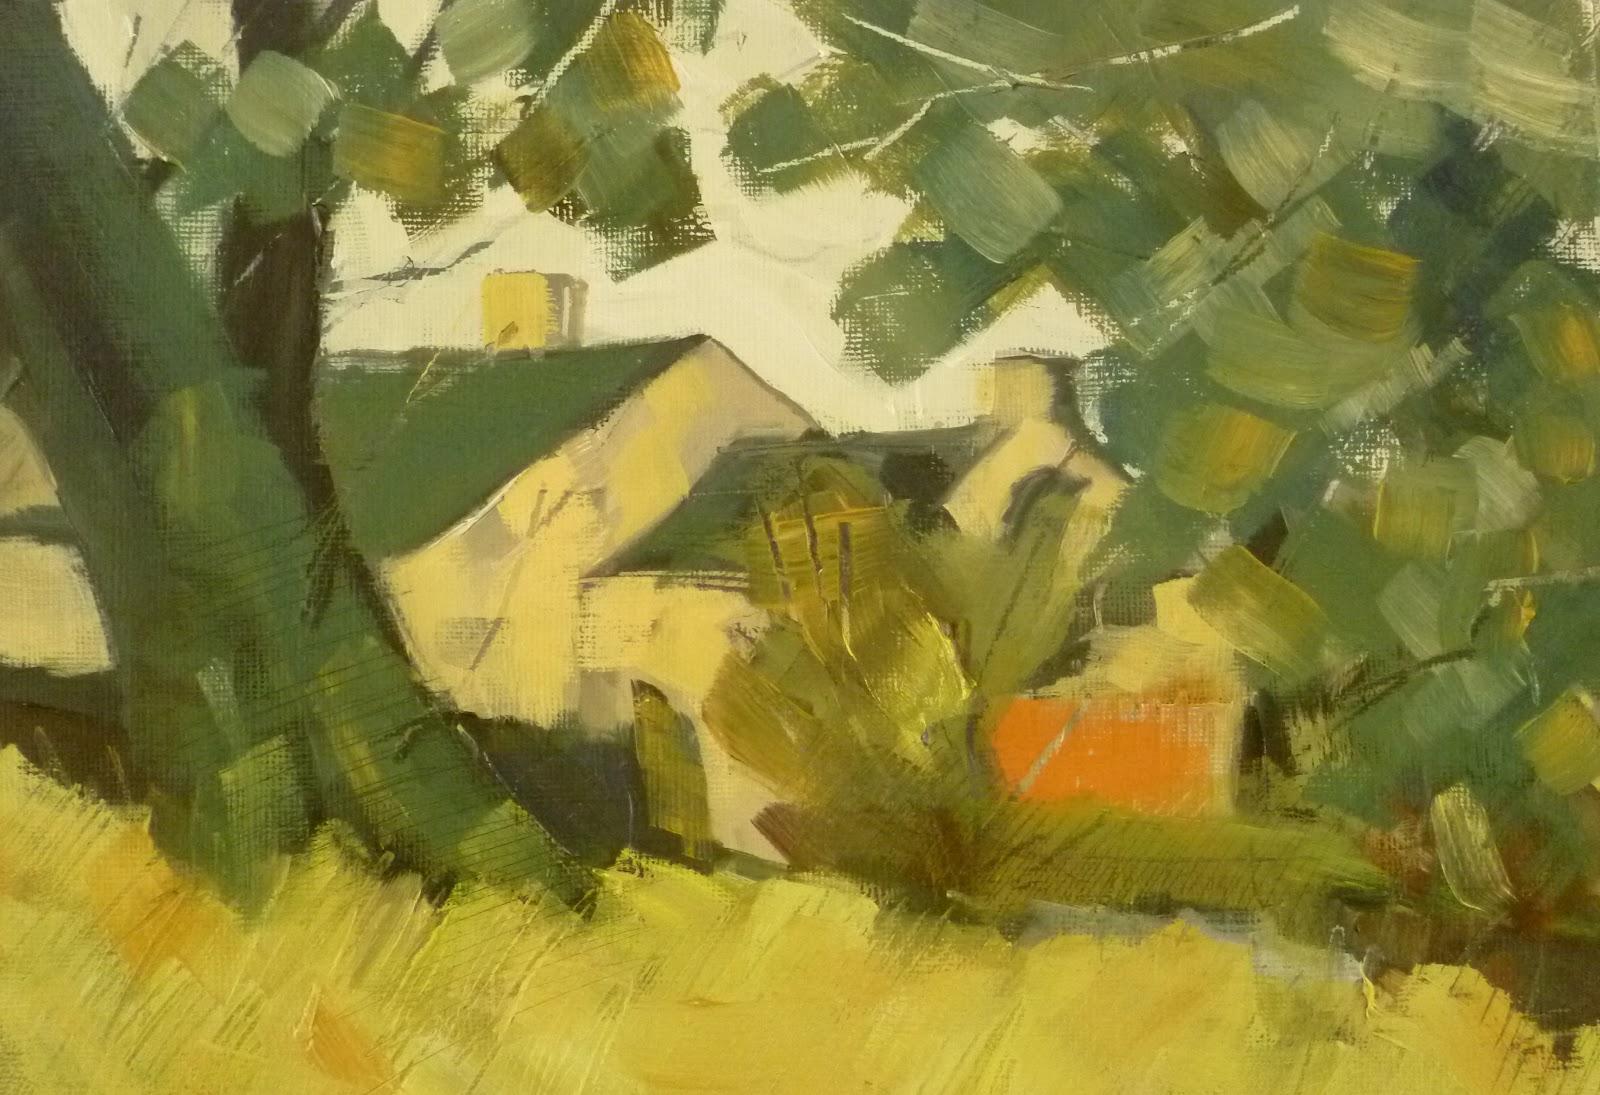 http://1.bp.blogspot.com/-kiSD9curPGY/T6mPYvHxFxI/AAAAAAAA8Ec/ID7F8exSAwc/s1600/Pendle+Forest+oil+on+paper+Twistham.jpg